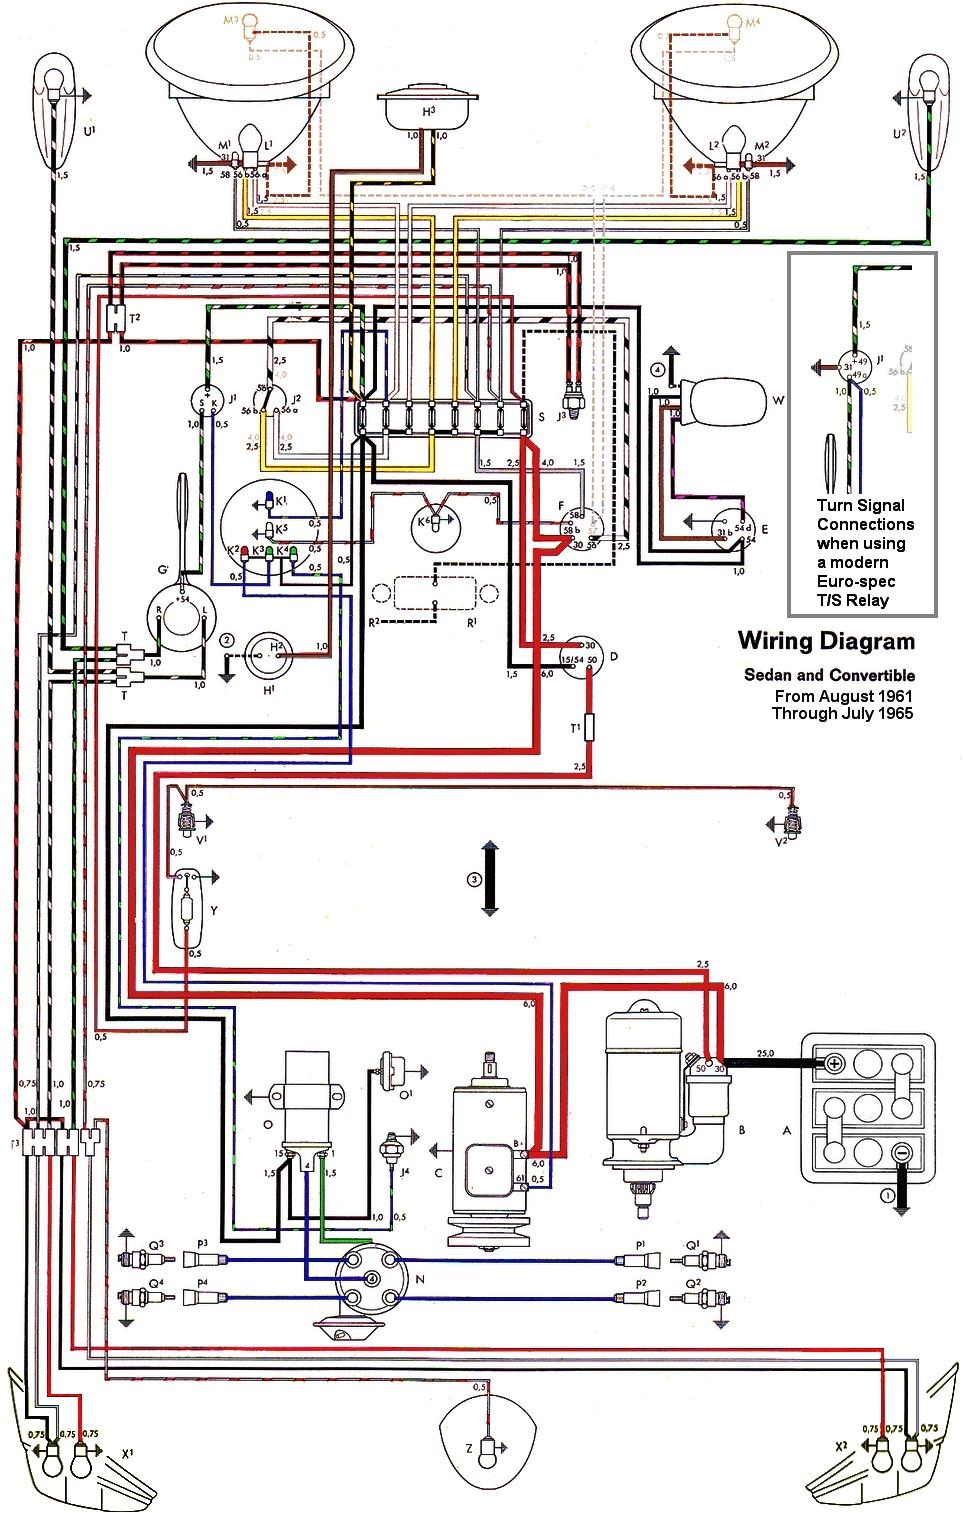 thesamba com type 1 wiring diagrams 1973 vw bus wiring diagram 1973 vw wiring diagram